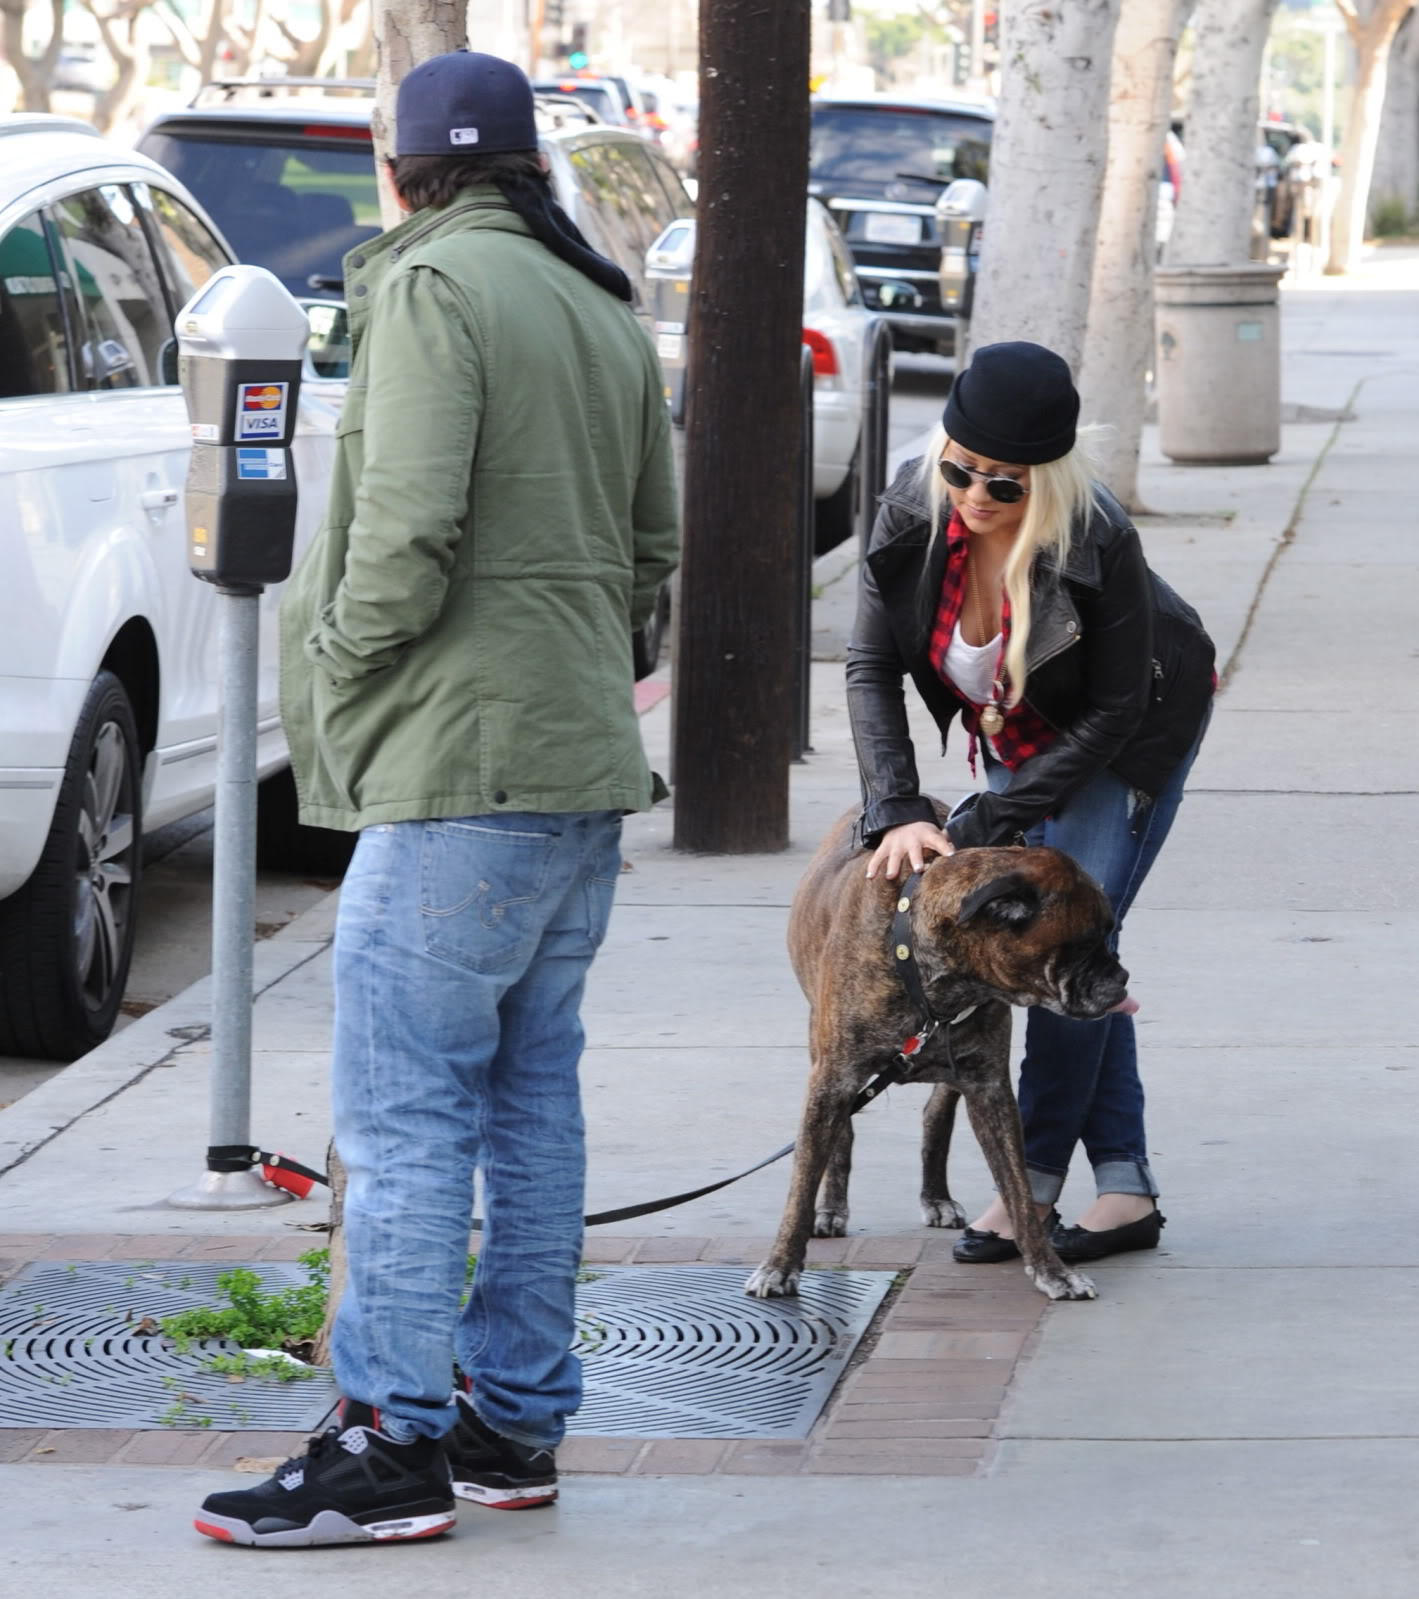 [Fotos] Christina Aguilera y Jordan Bratman se reúnen para Almorzar (9/Feb/2013) Cuj4